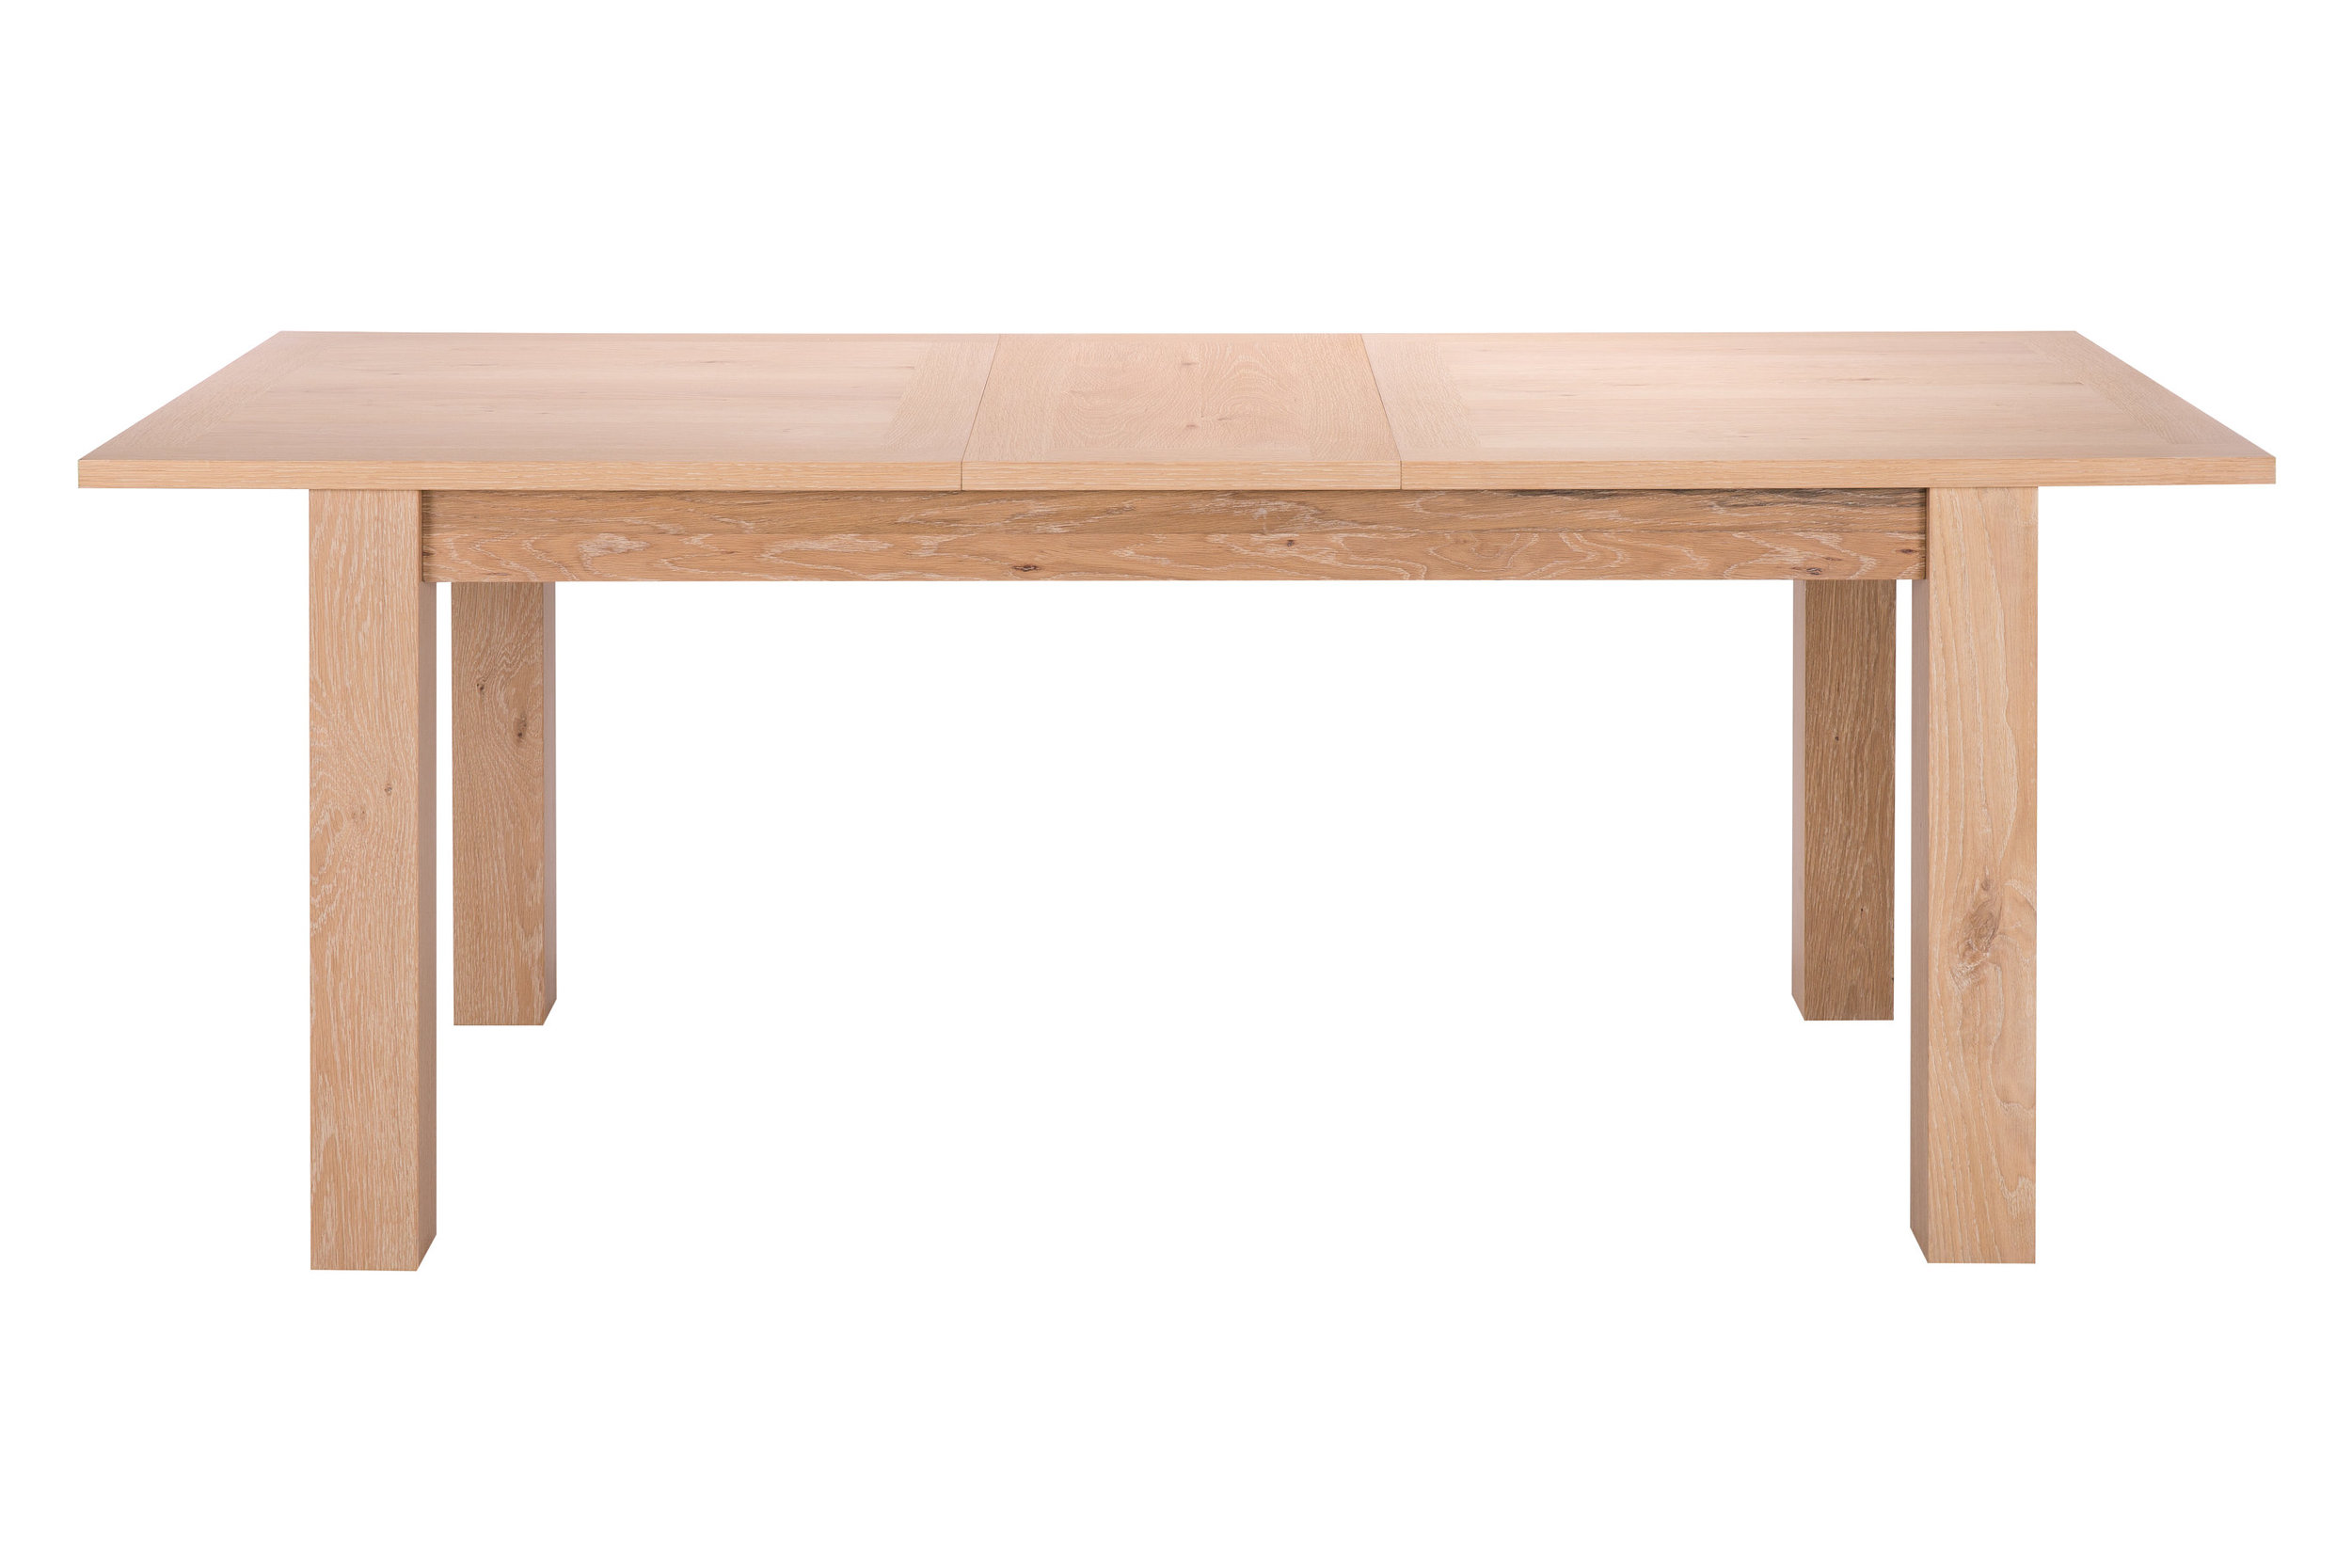 Simple_Furniture_product_TBP_3.jpg